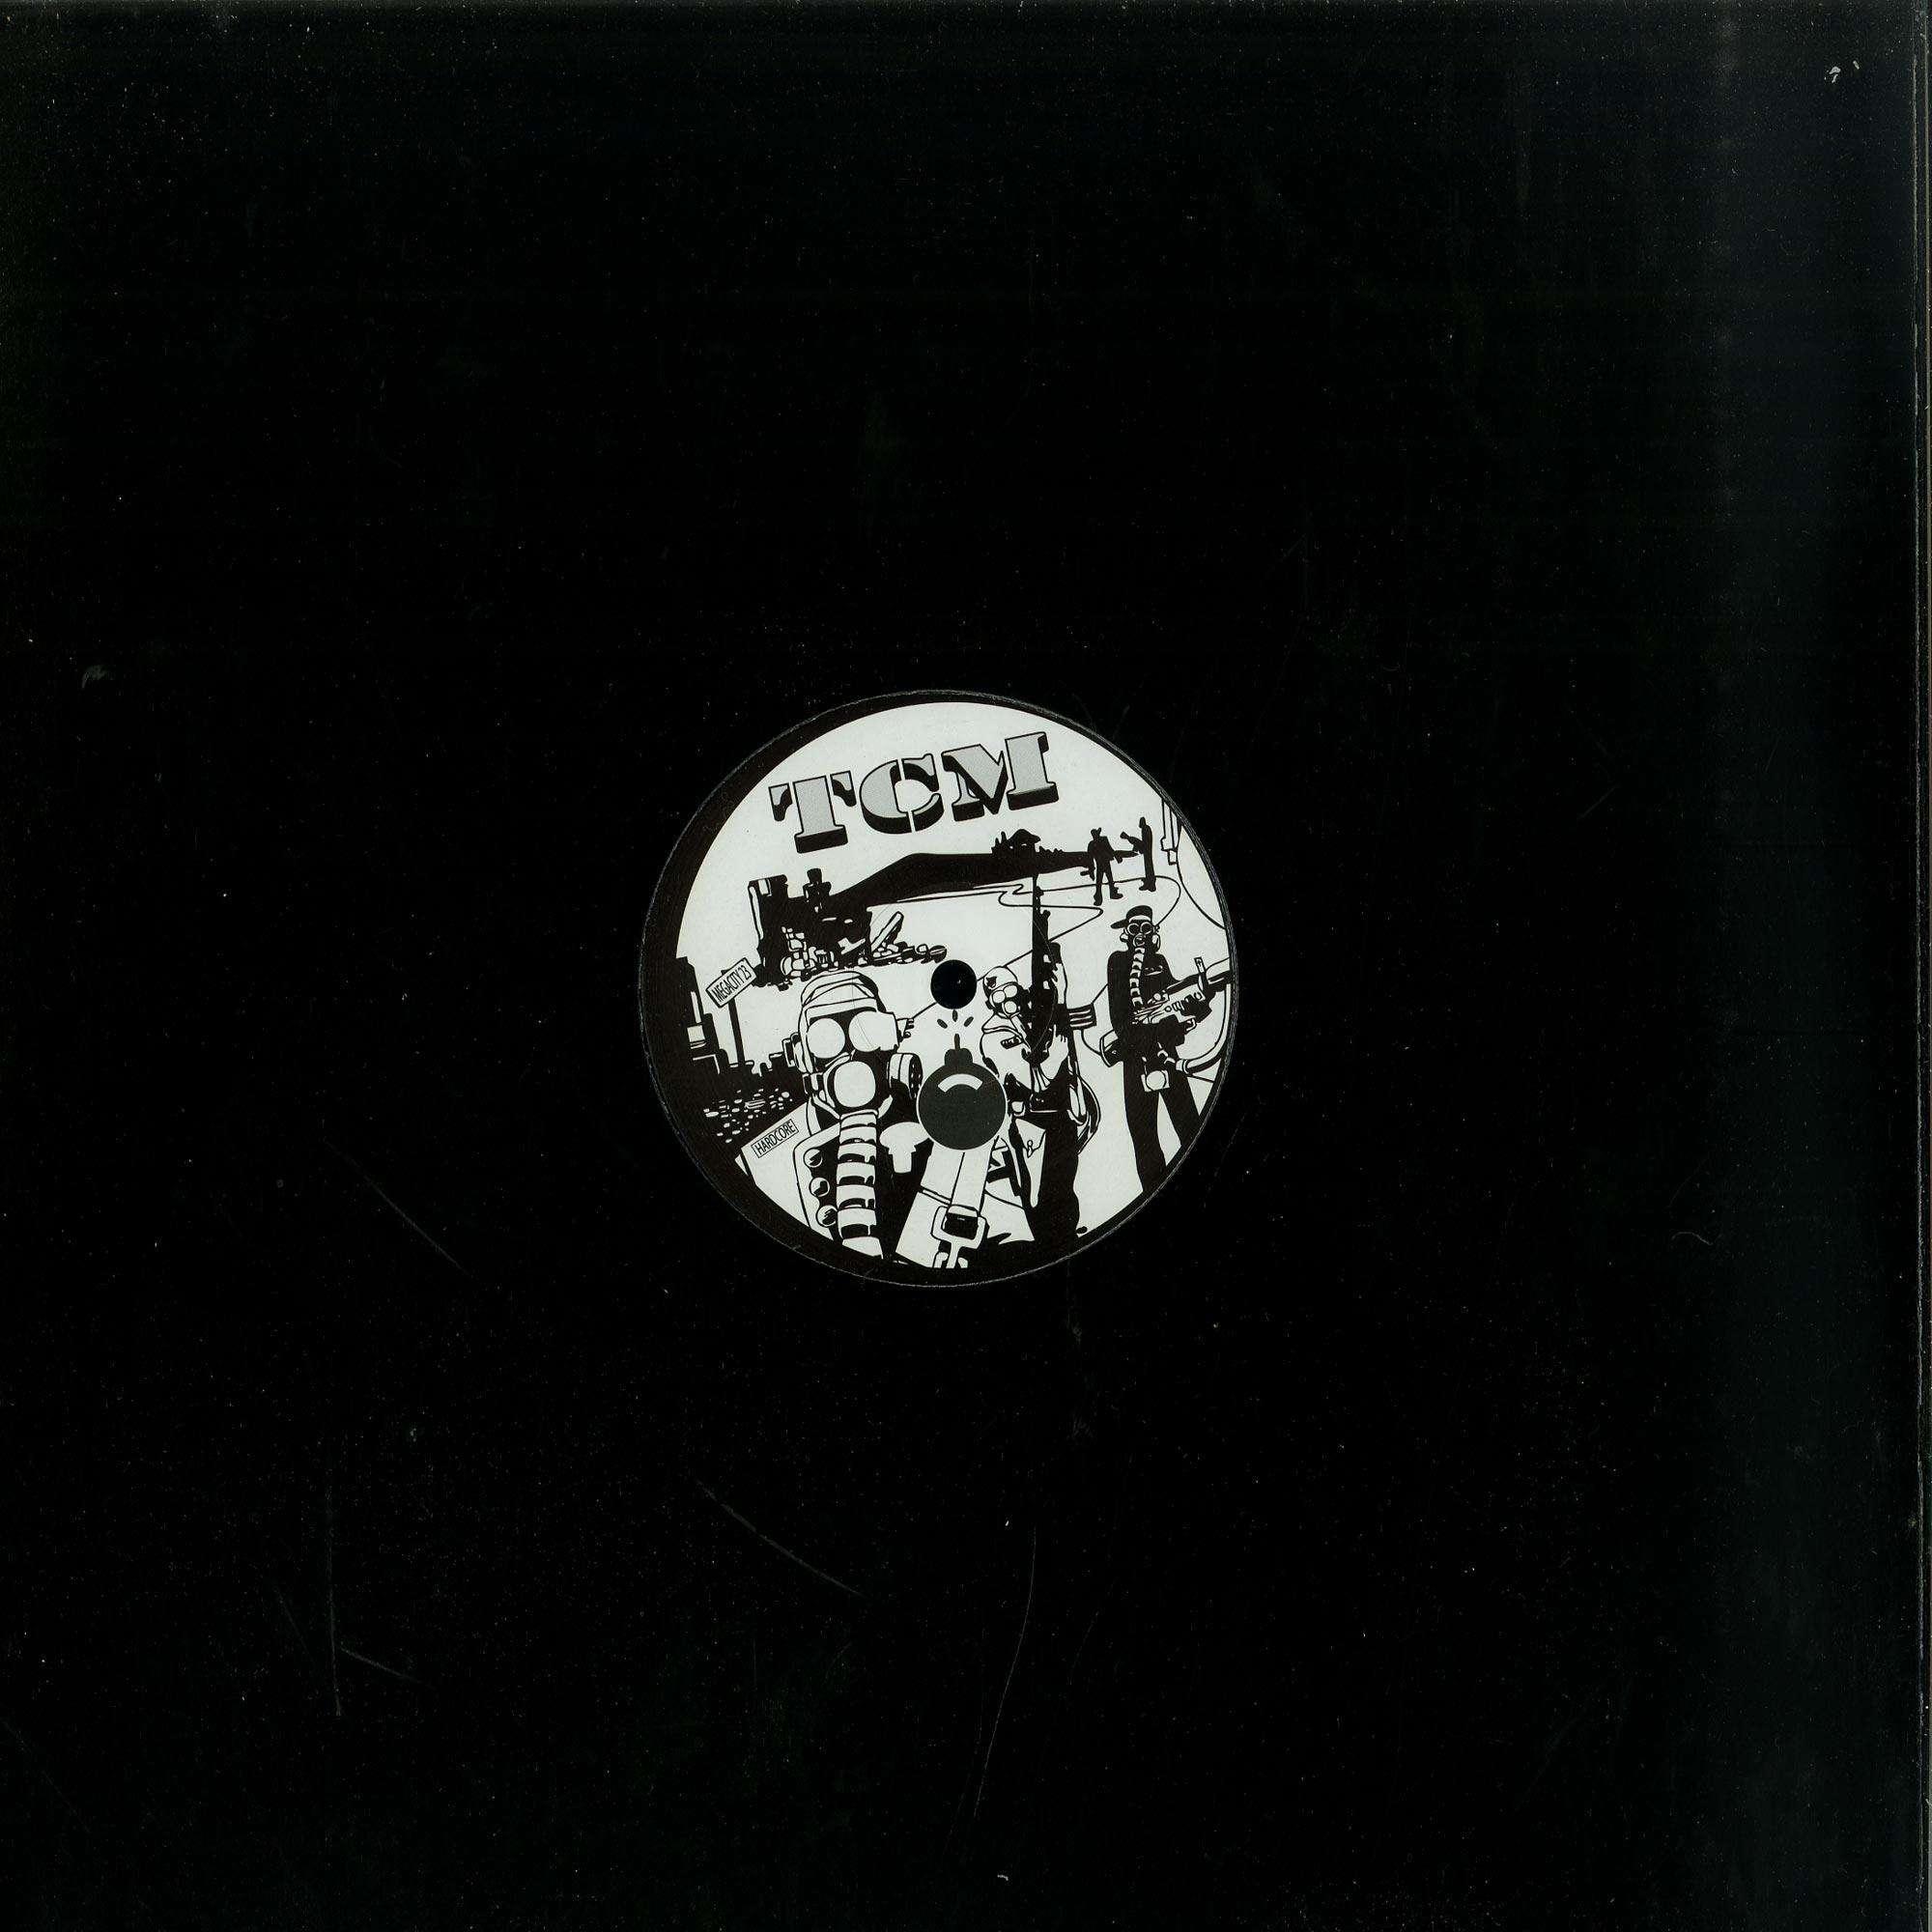 The Criminal Minds - THE GOSPEL ACCORDING TO A SOUNDBWOY / DRUMS OF DOOM